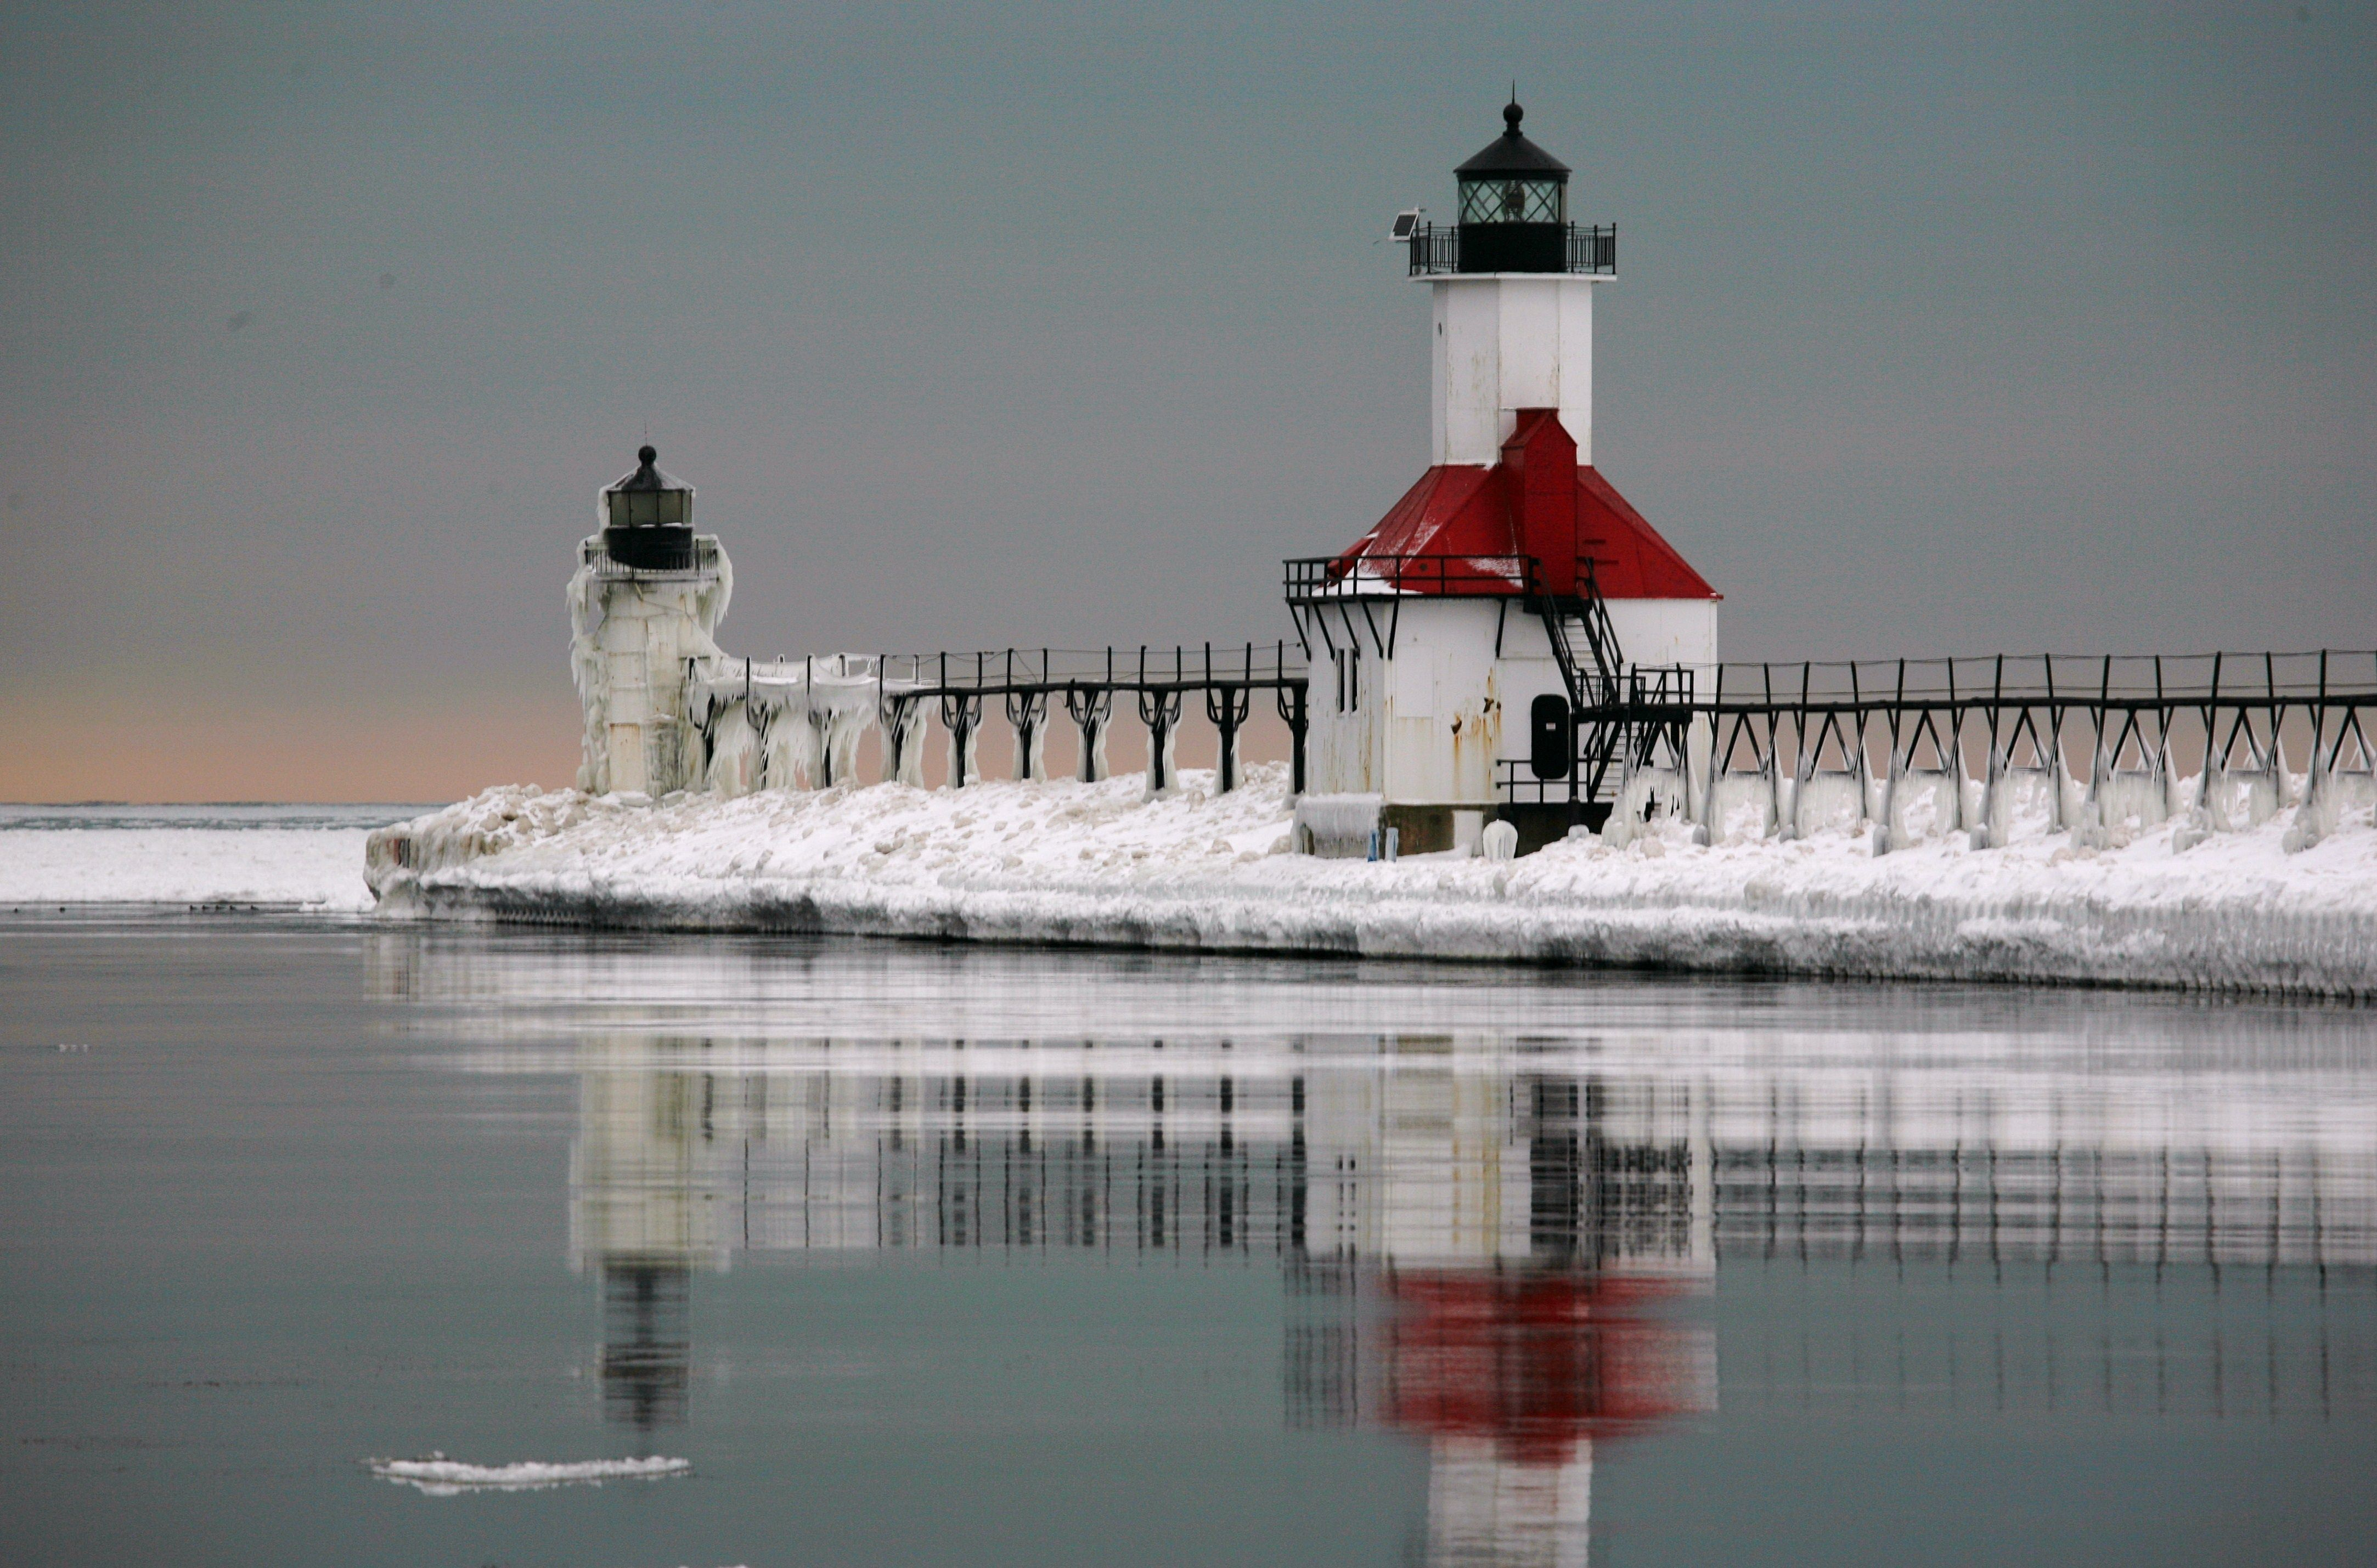 Lighthouse at St. Joseph North Pier, Lake Michigan [x-post  /r/GreatLakesPics] ... | St joseph mi, St joseph lighthouse, St joseph